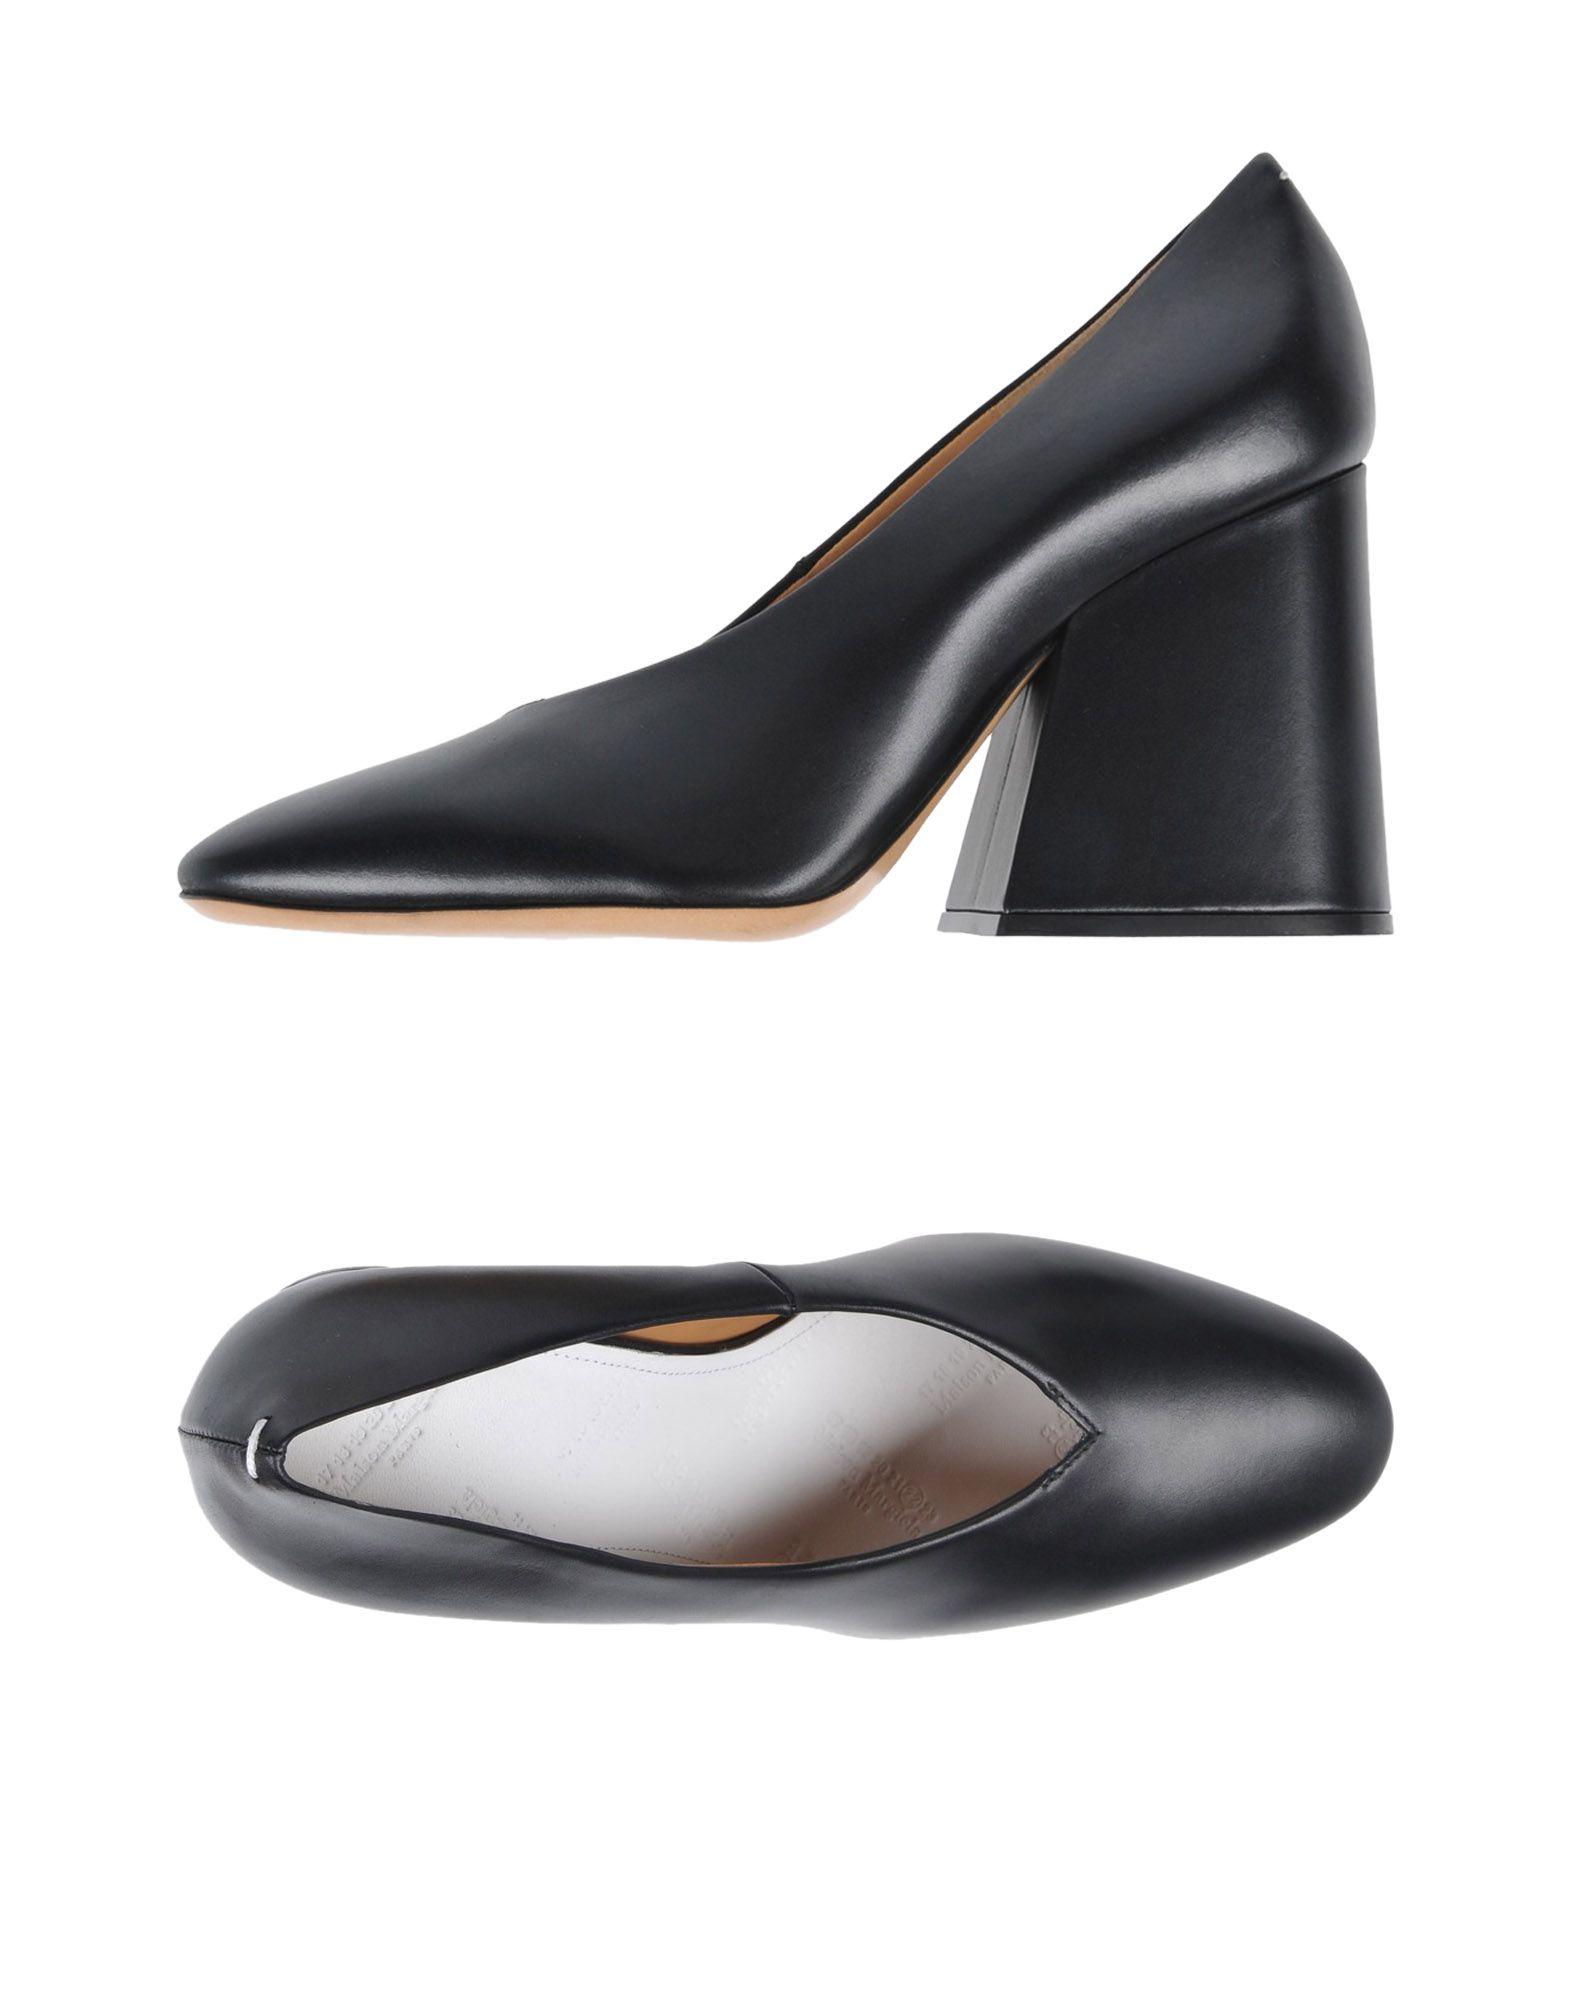 MAISON MARGIELA Pumps. Leather No appliqués Solid color Round toeline Square heel Leather lining Leather sole Contains non-textile parts of animal origin. Soft Leather